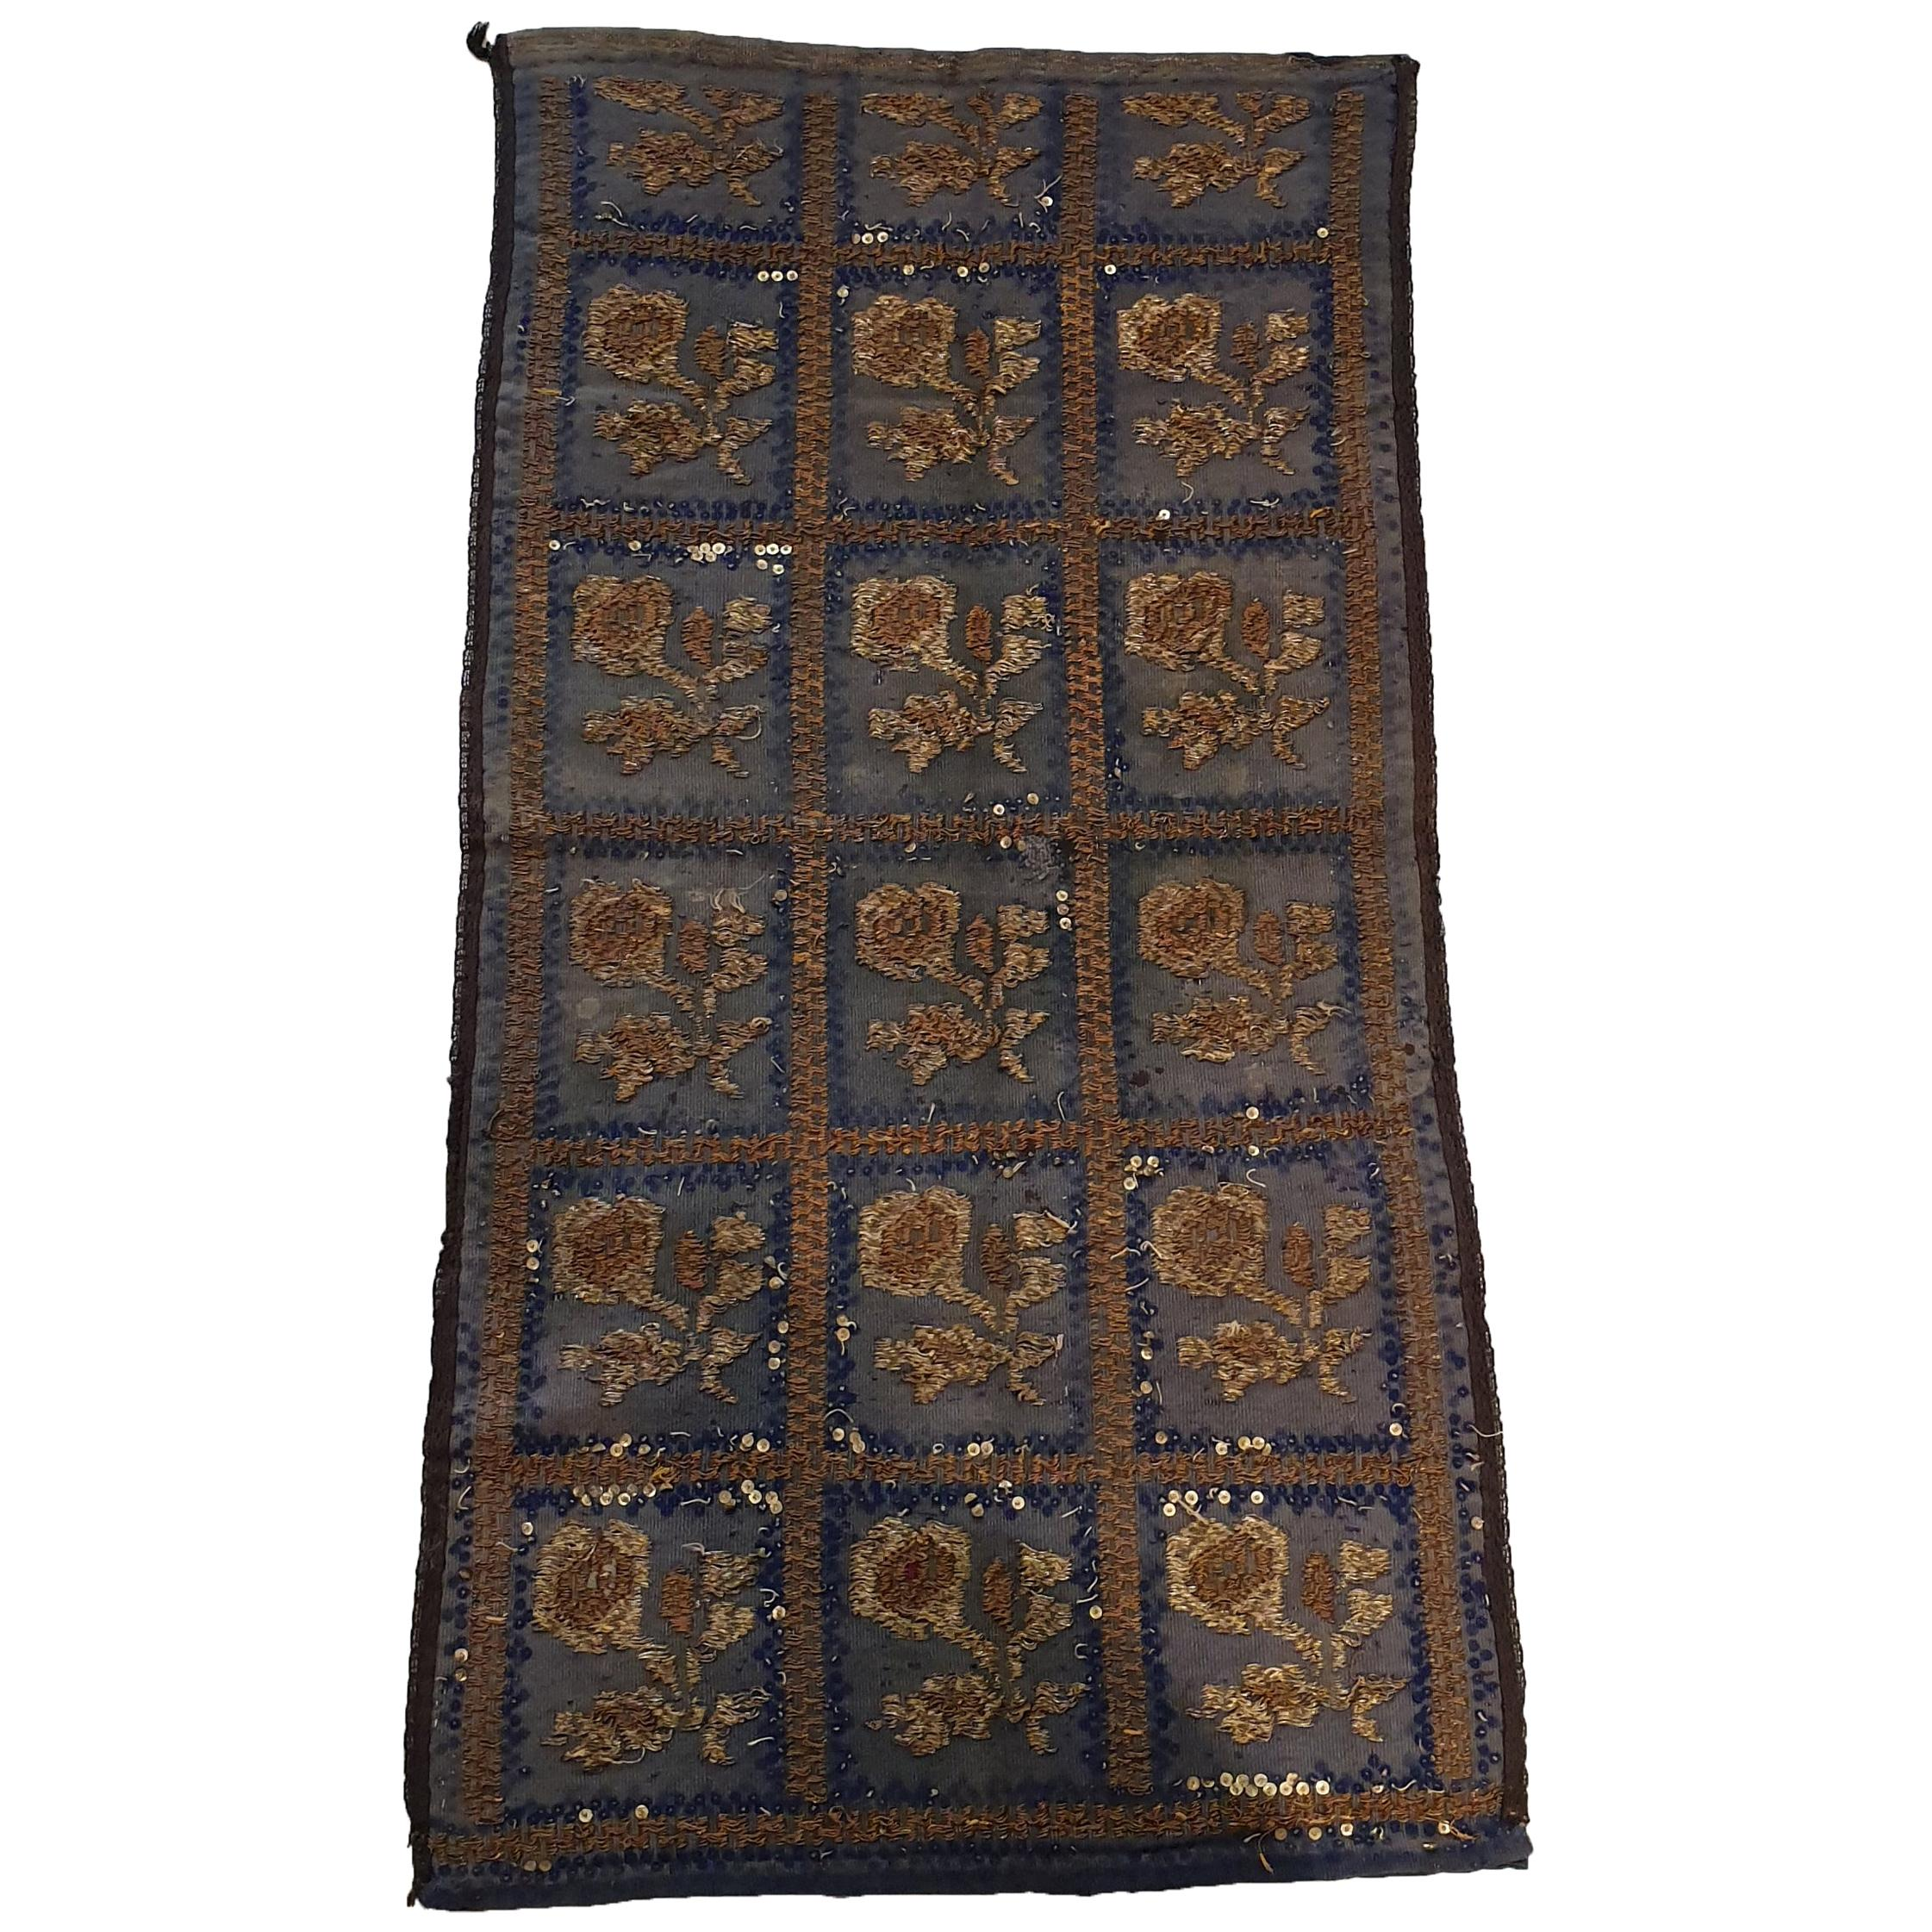 714 - Beautiful Antique Turkish Ottoman Embroidery